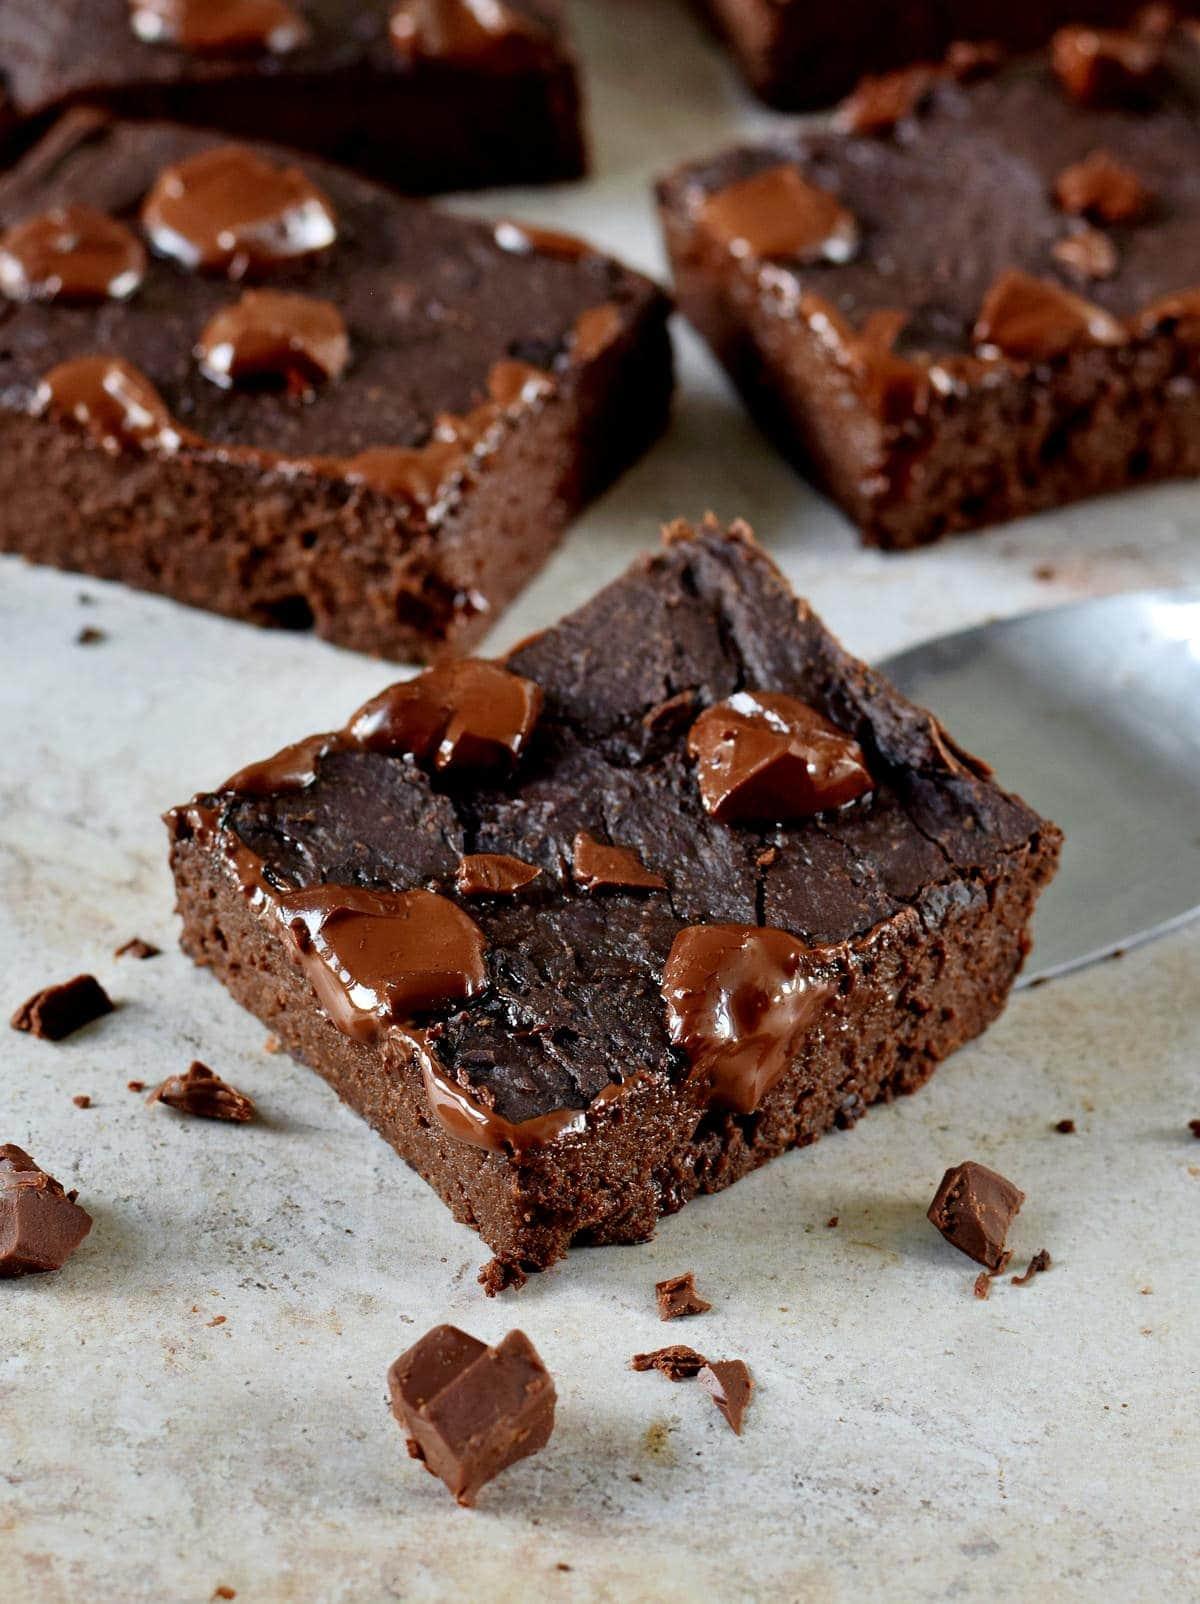 Nahaufnahme vegane Brownies mit geschmolzener Schokolade obendrauf